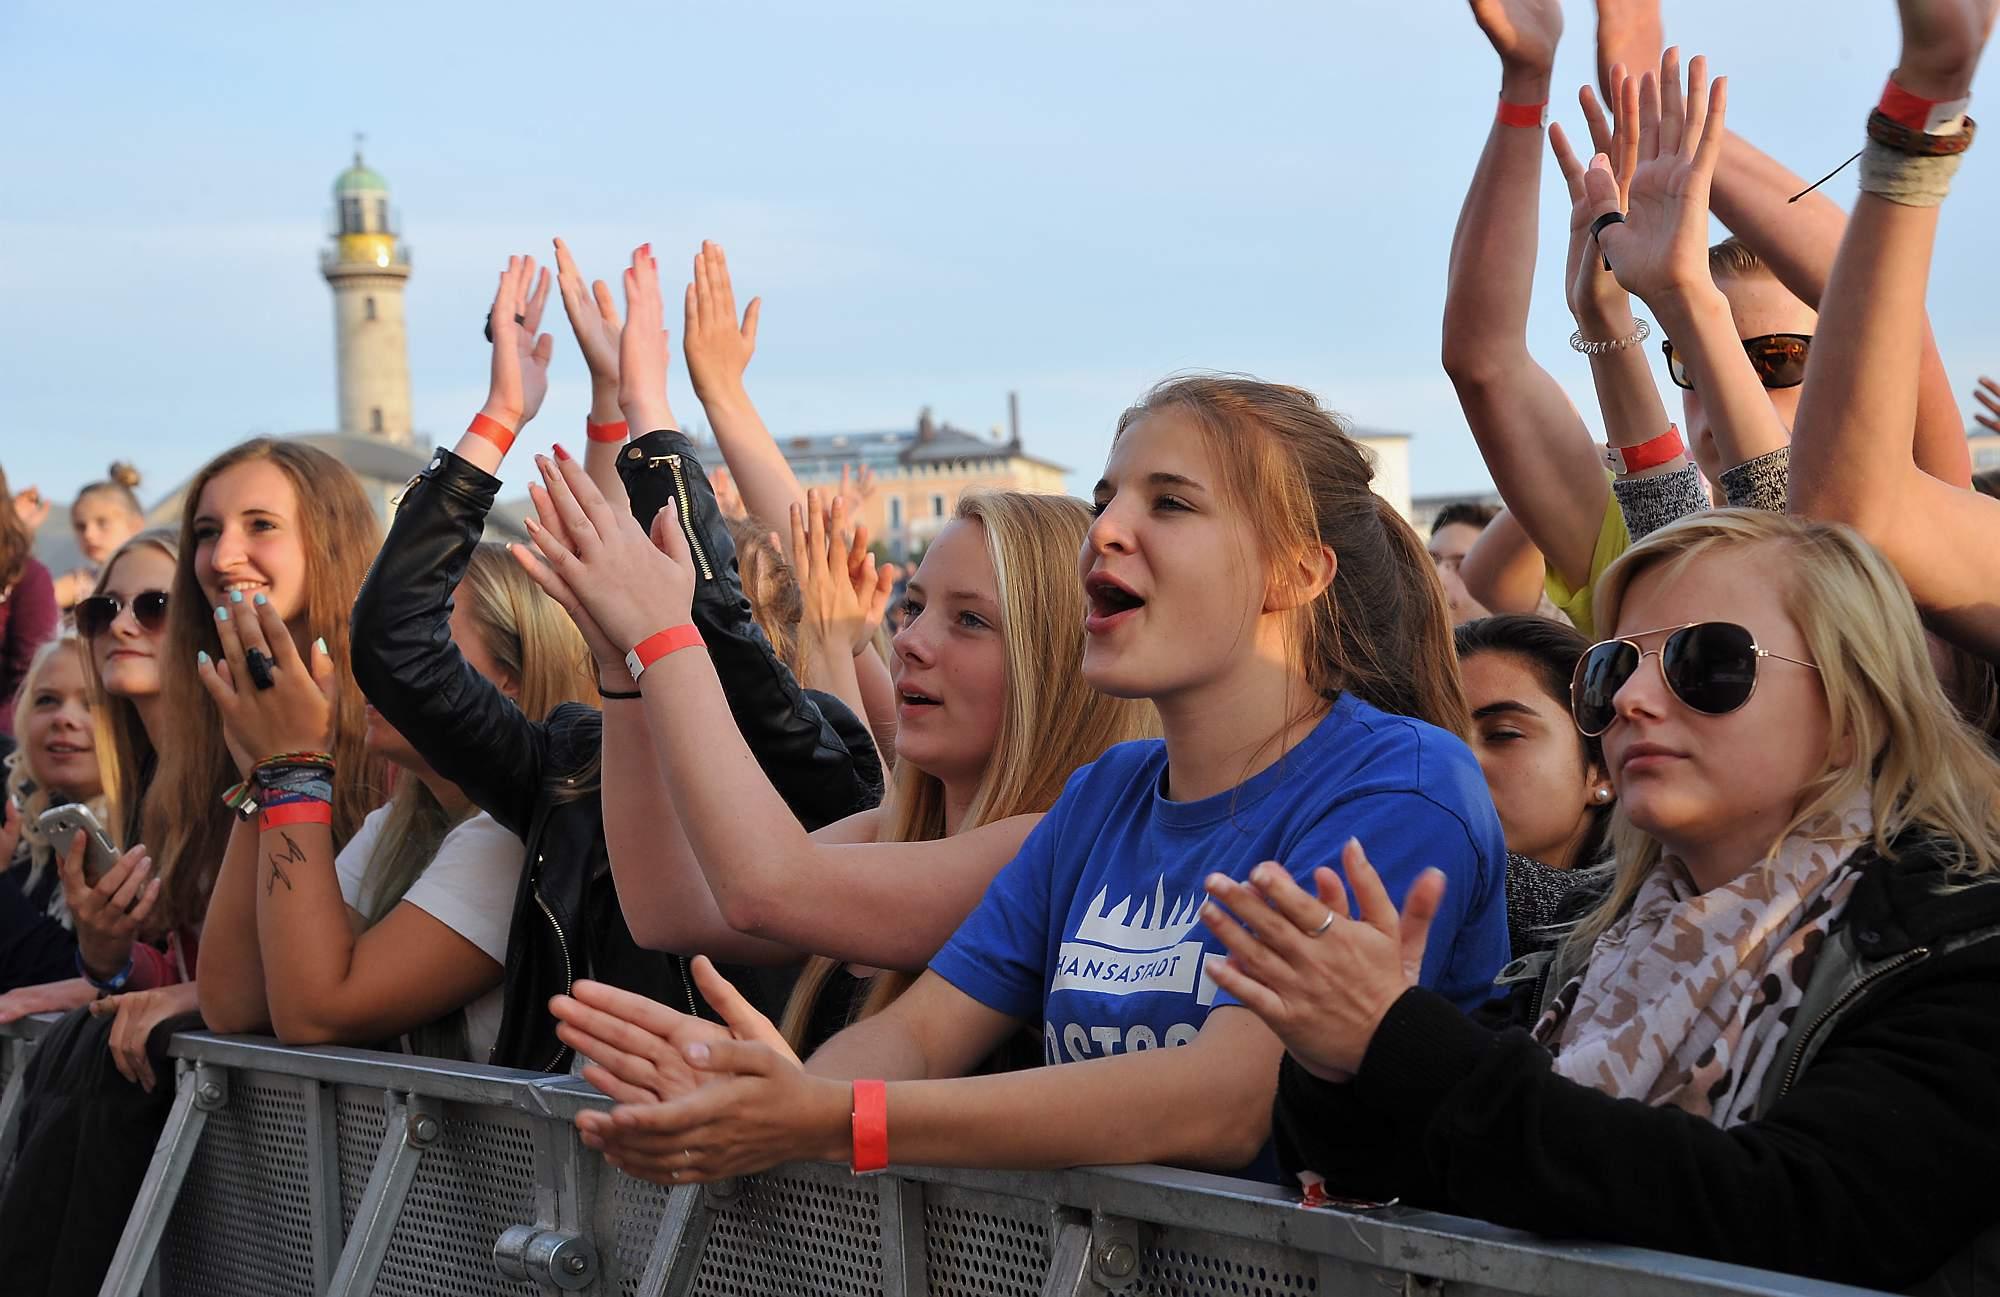 Fans feiern Mark Forster bei stars@ndr2 in Warnemünde. Foto: Joachim Kloock